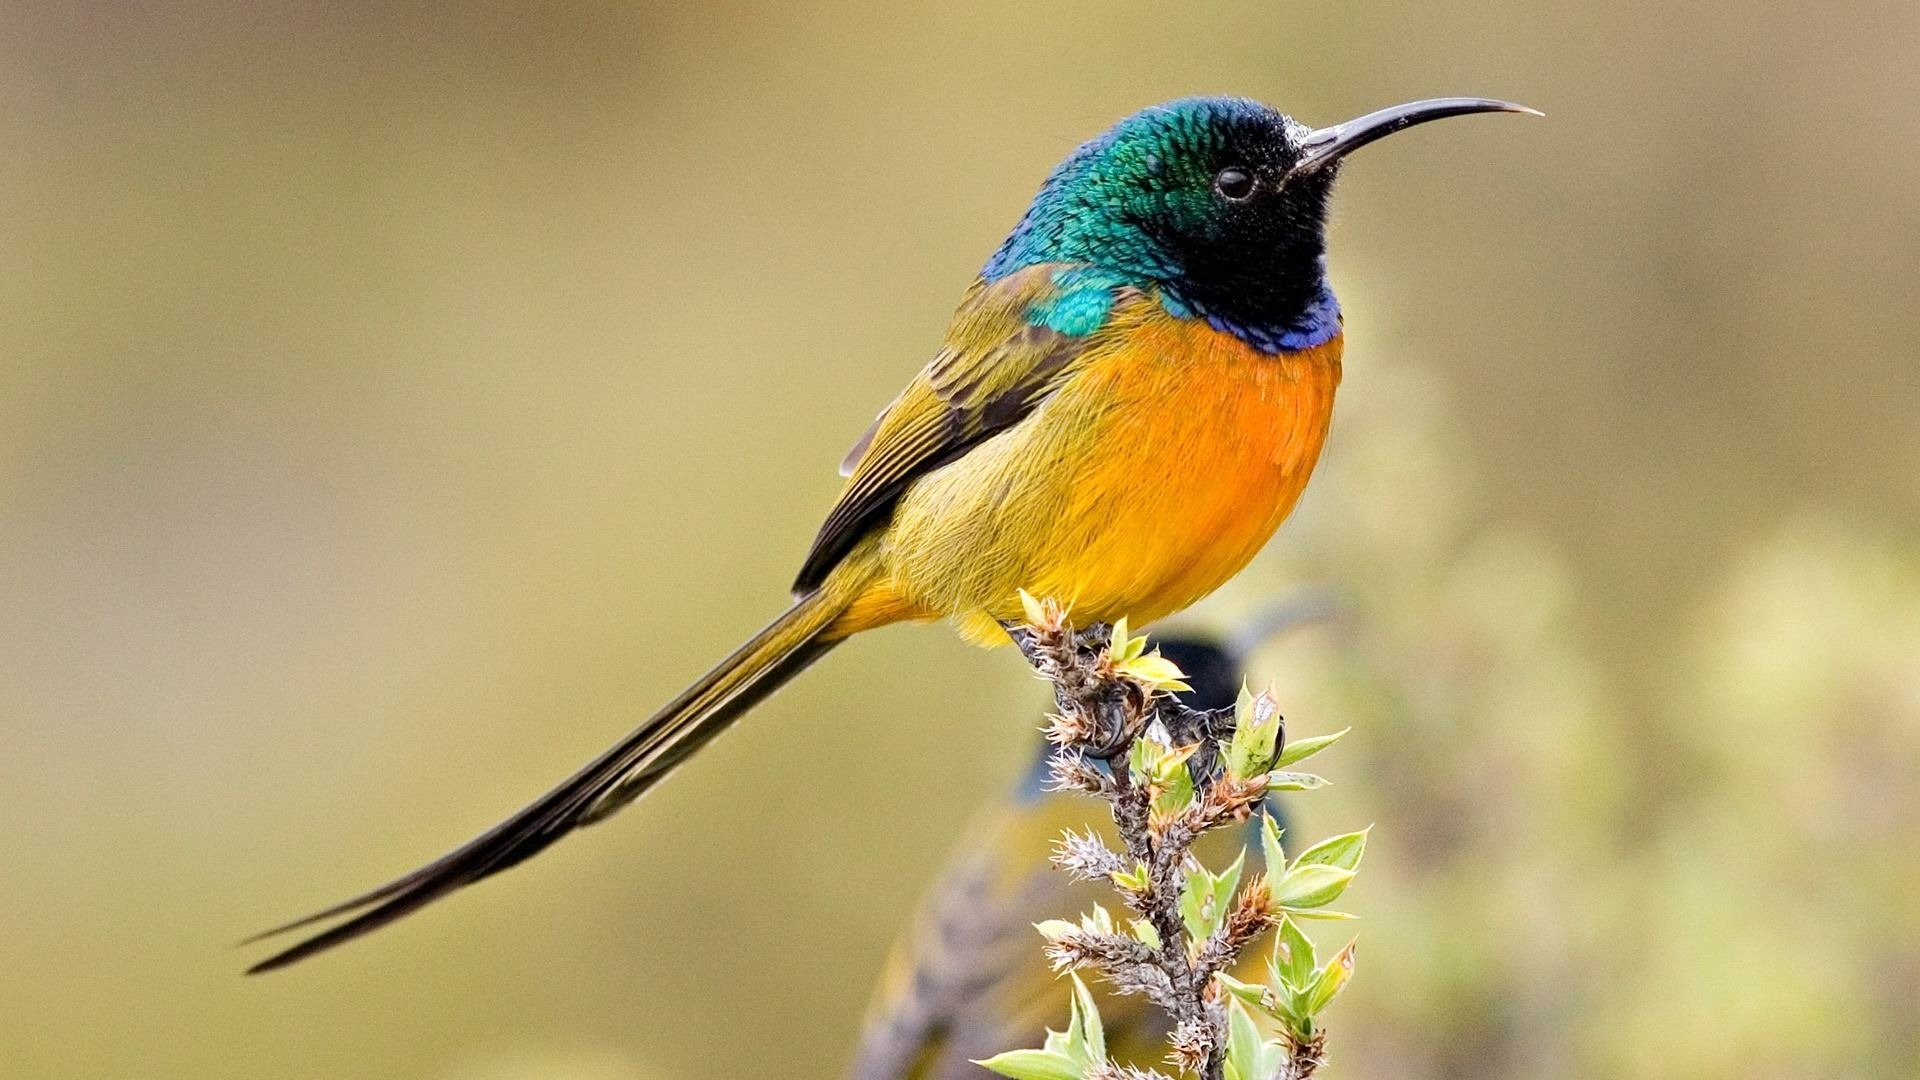 Colorful Bird desktop wallpaper free download